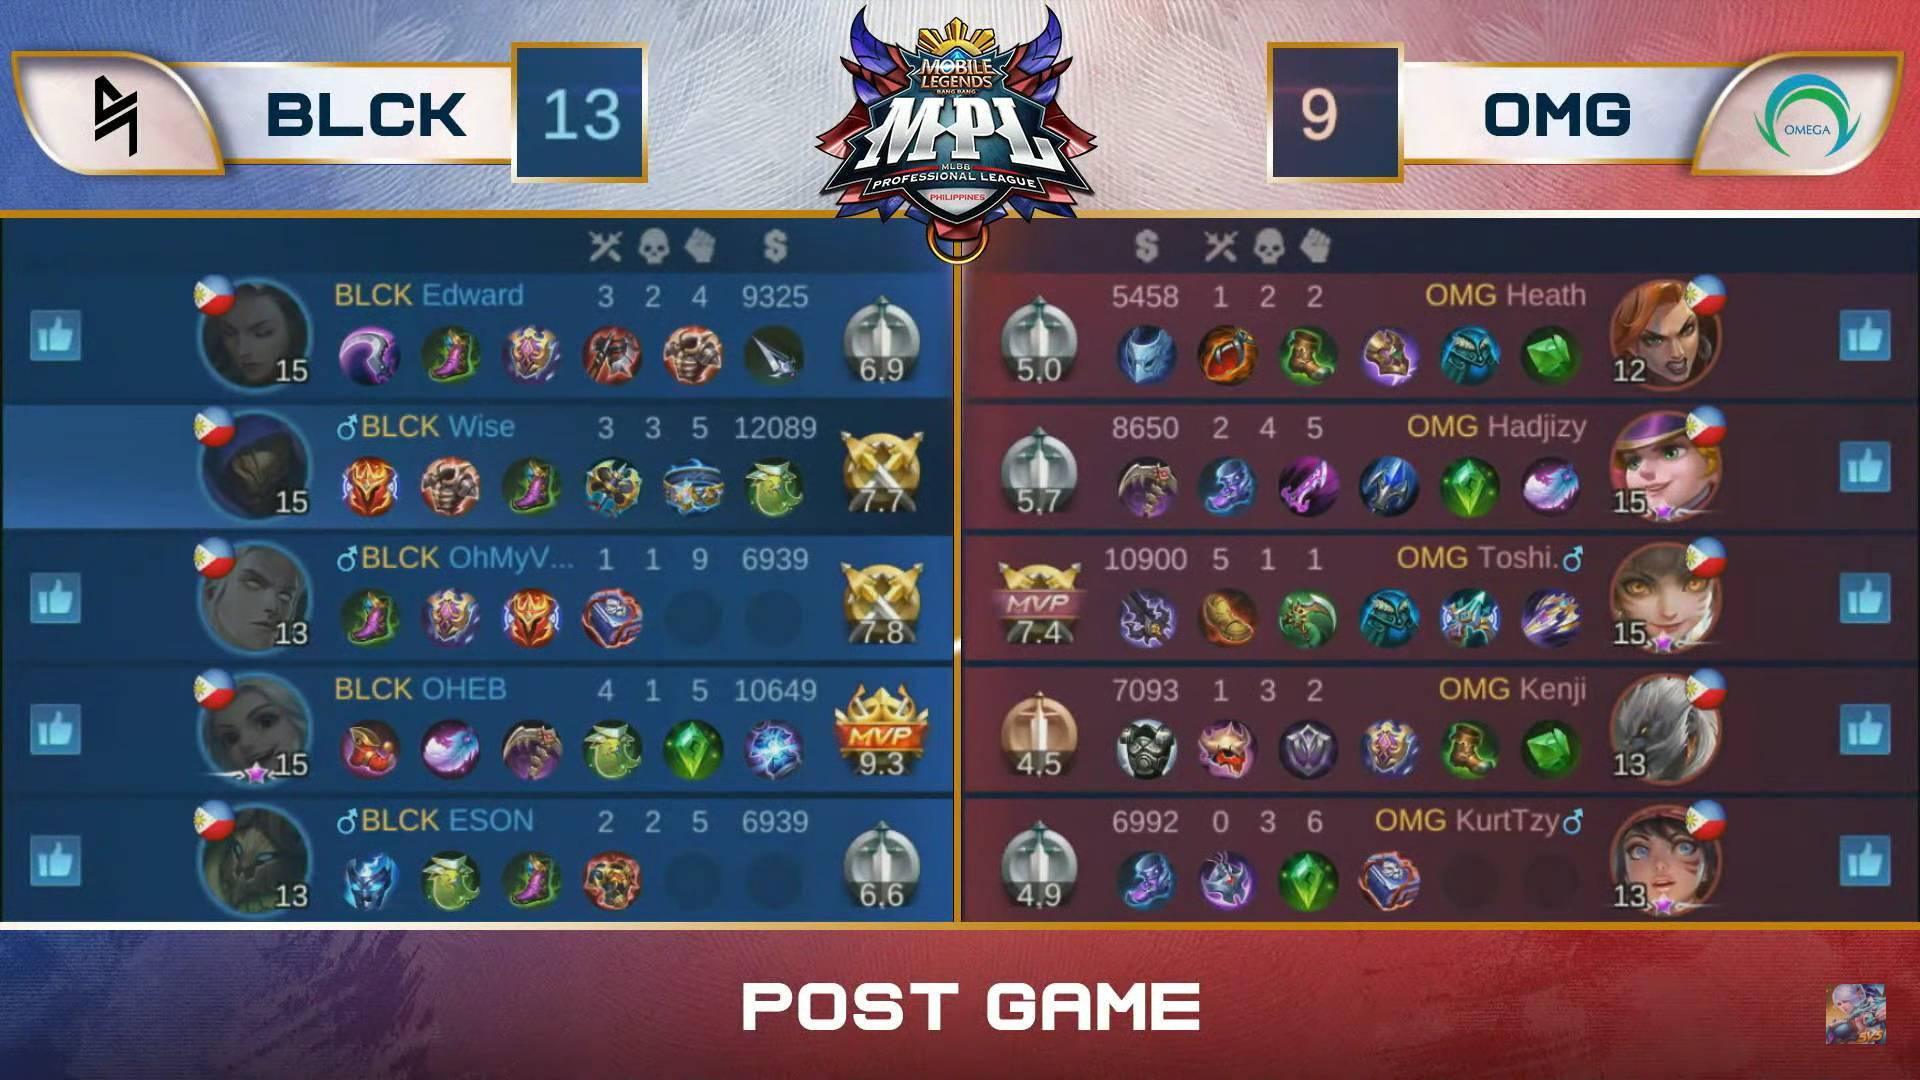 MPL-PH-Season-7-Blacklist-def-Omega-Game-1 Blacklist shocks Omega with Aldous, rises to 10-1 in MPL PH ESports Mobile Legends MPL-PH News  - philippine sports news